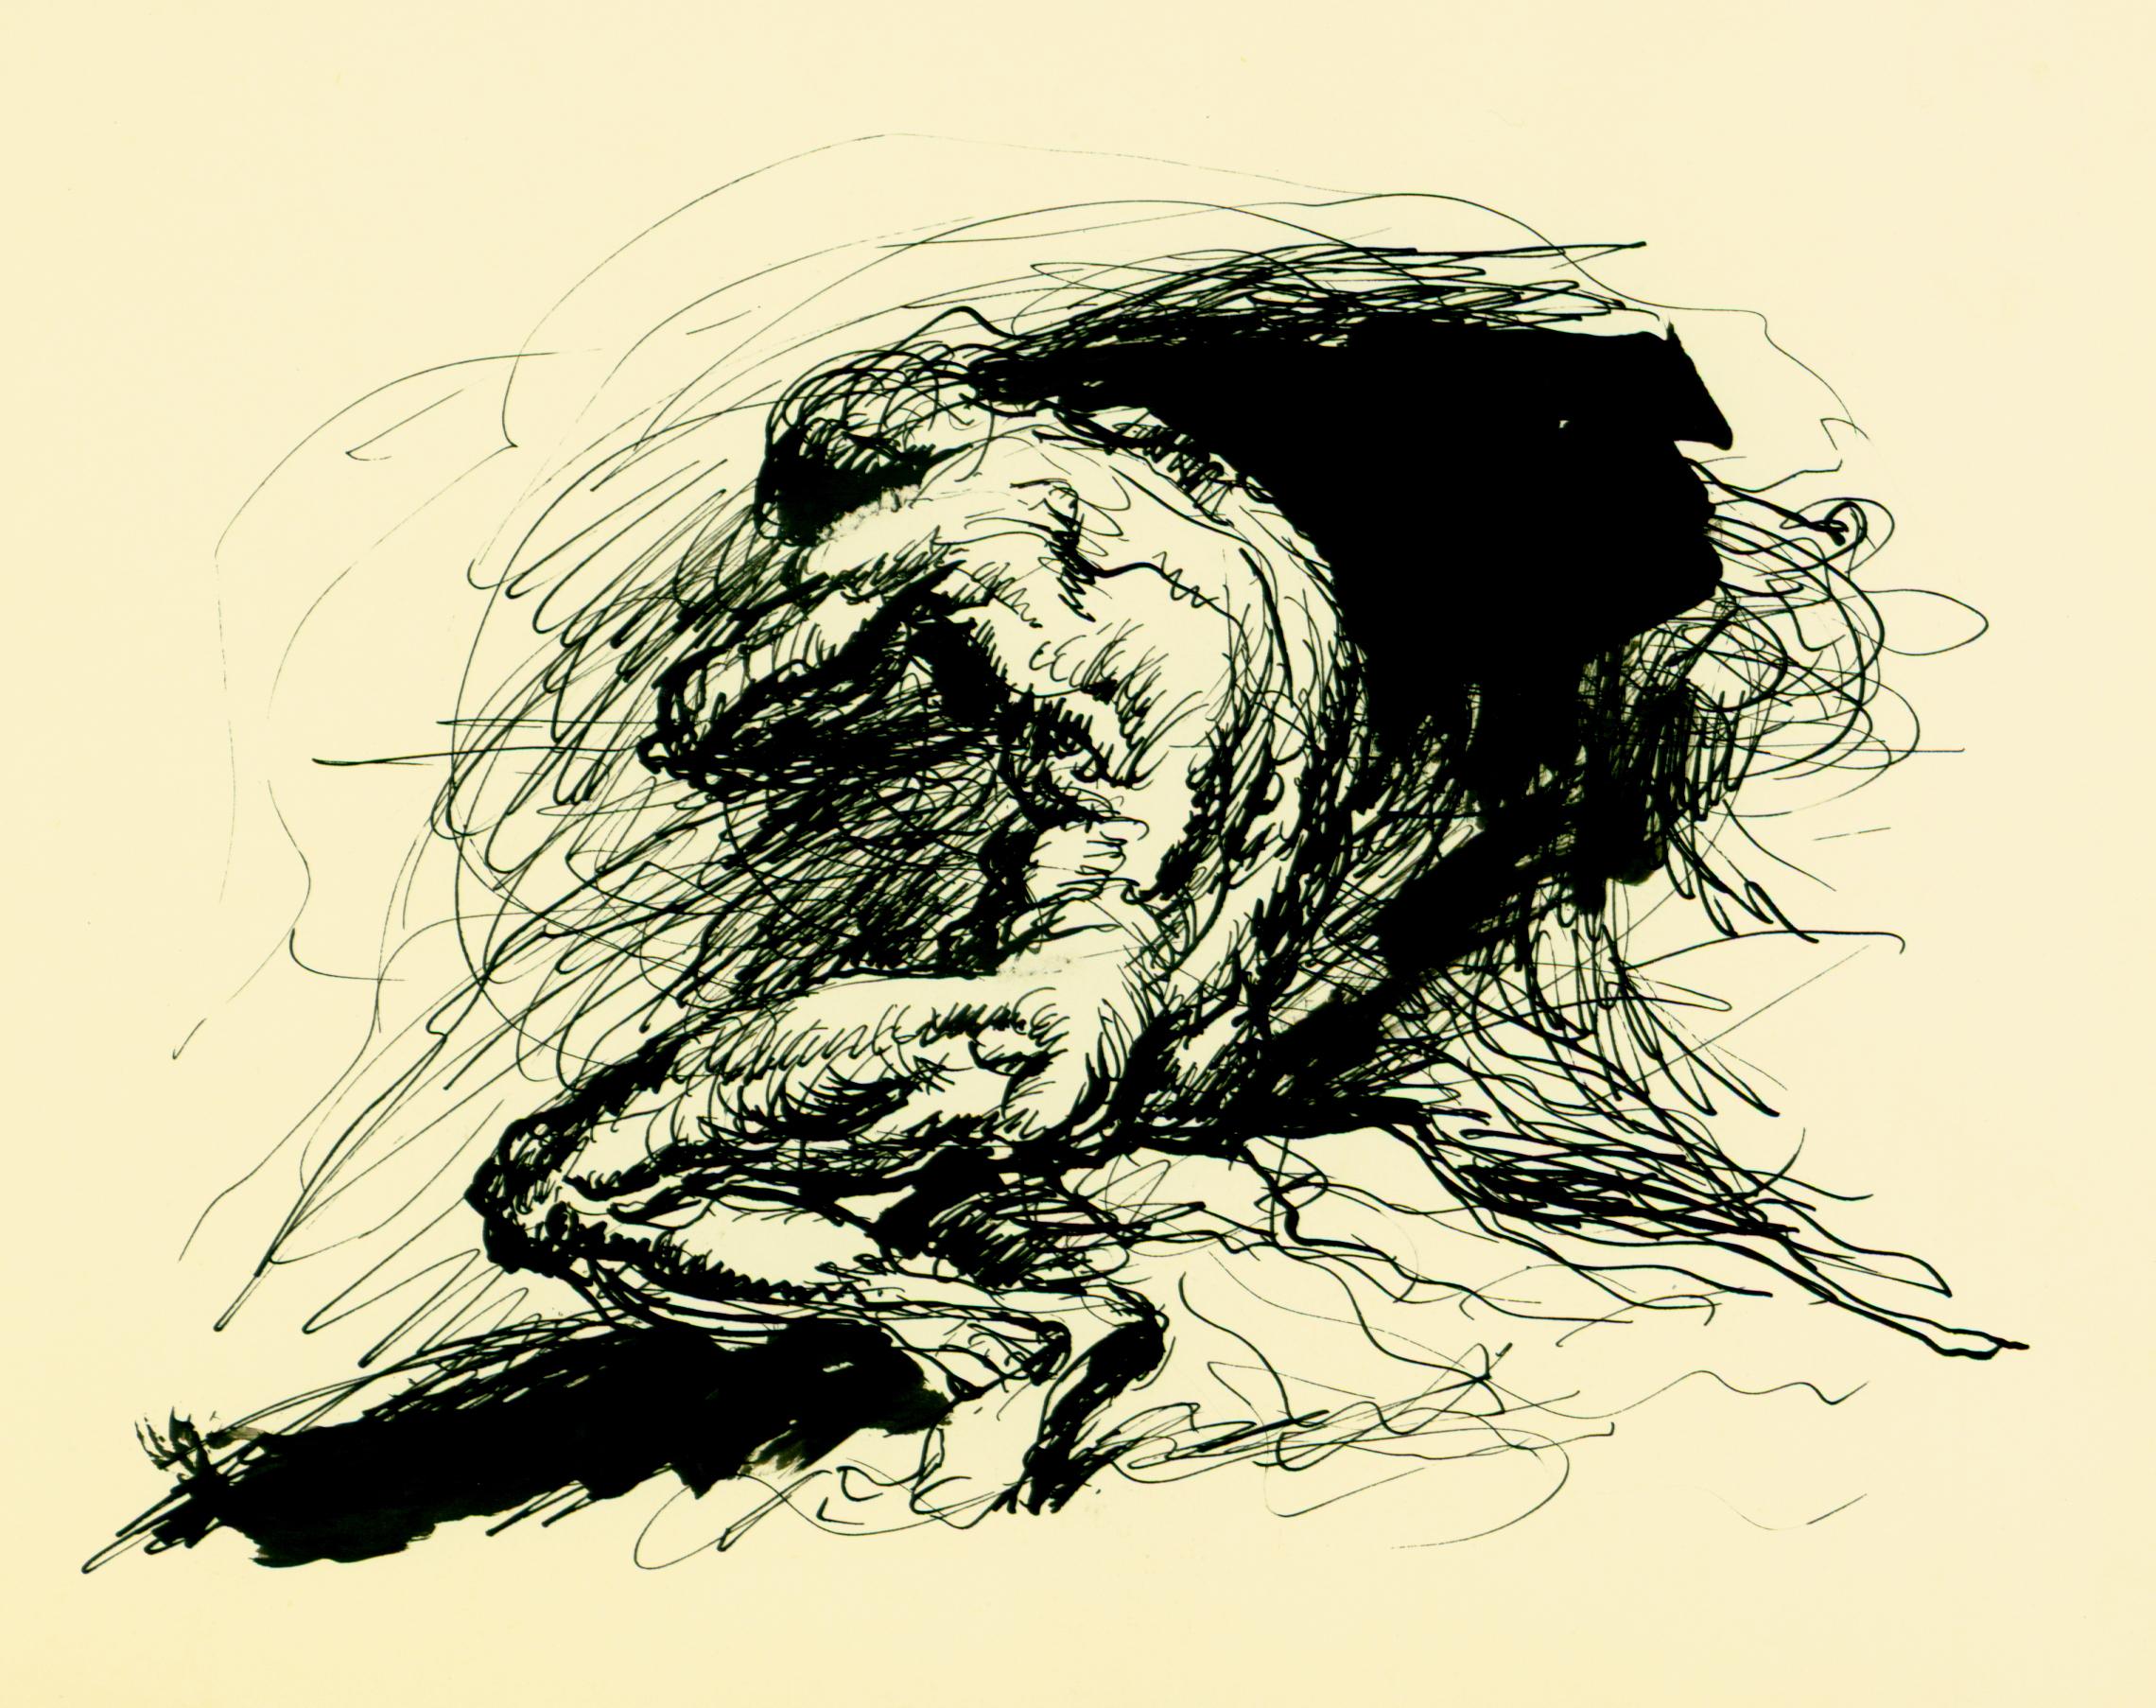 <font size='3' font color='gray'>MAN (pen & ink wash, 4 x 6)